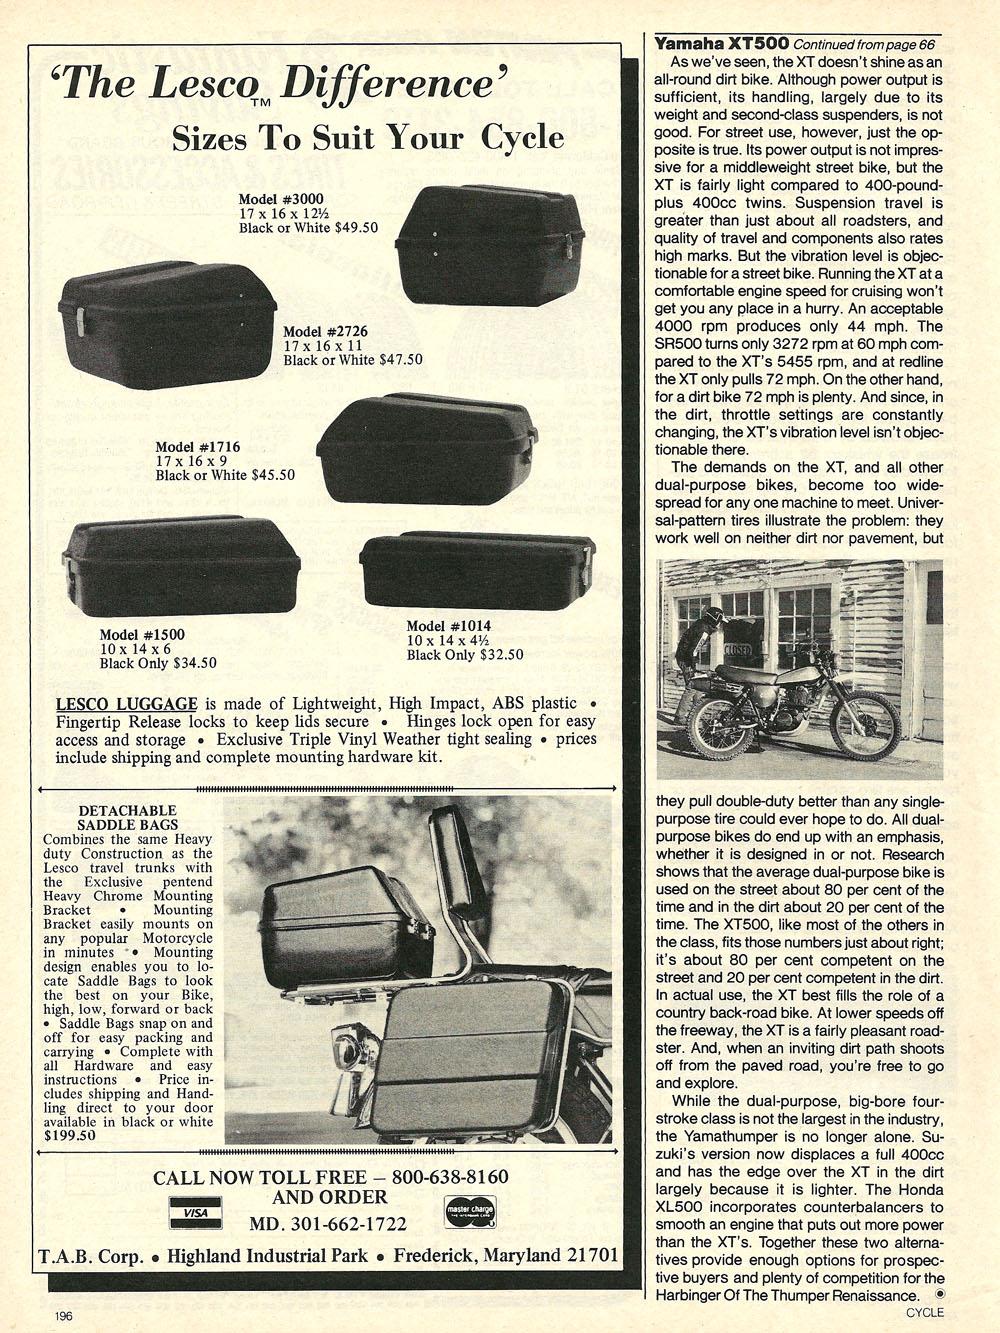 1980 Yamaha XT500G road test 07.jpg